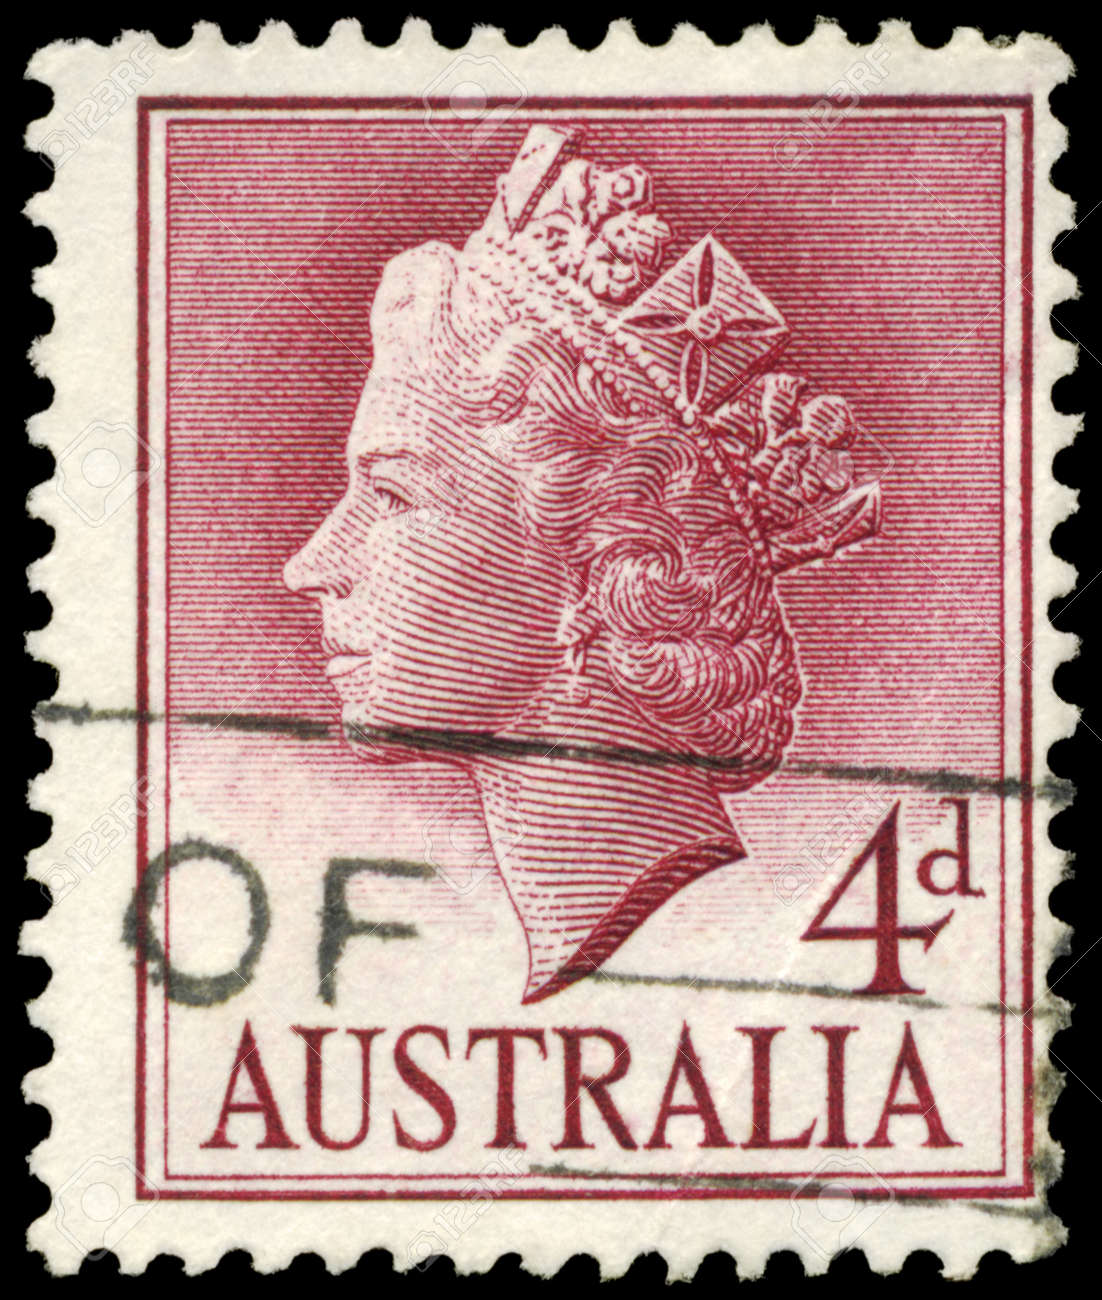 AUSTRALIA - CIRCA 1957: A Stamp printed in AUSTRALIA shows the portrait of a Queen Elizabeth II, series, circa 1957 Stock Photo - 16375793